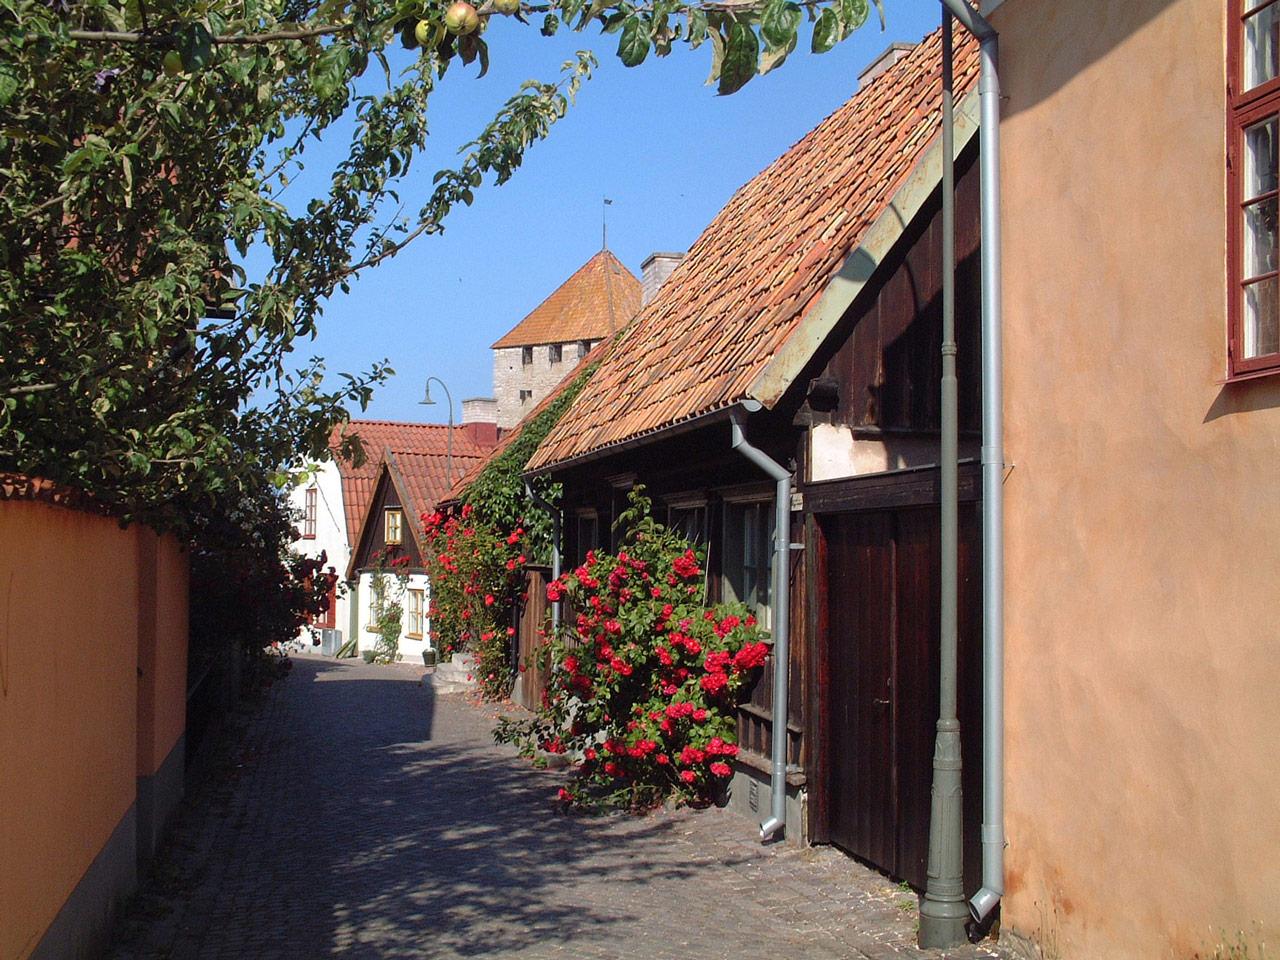 Rosornas stad Visby